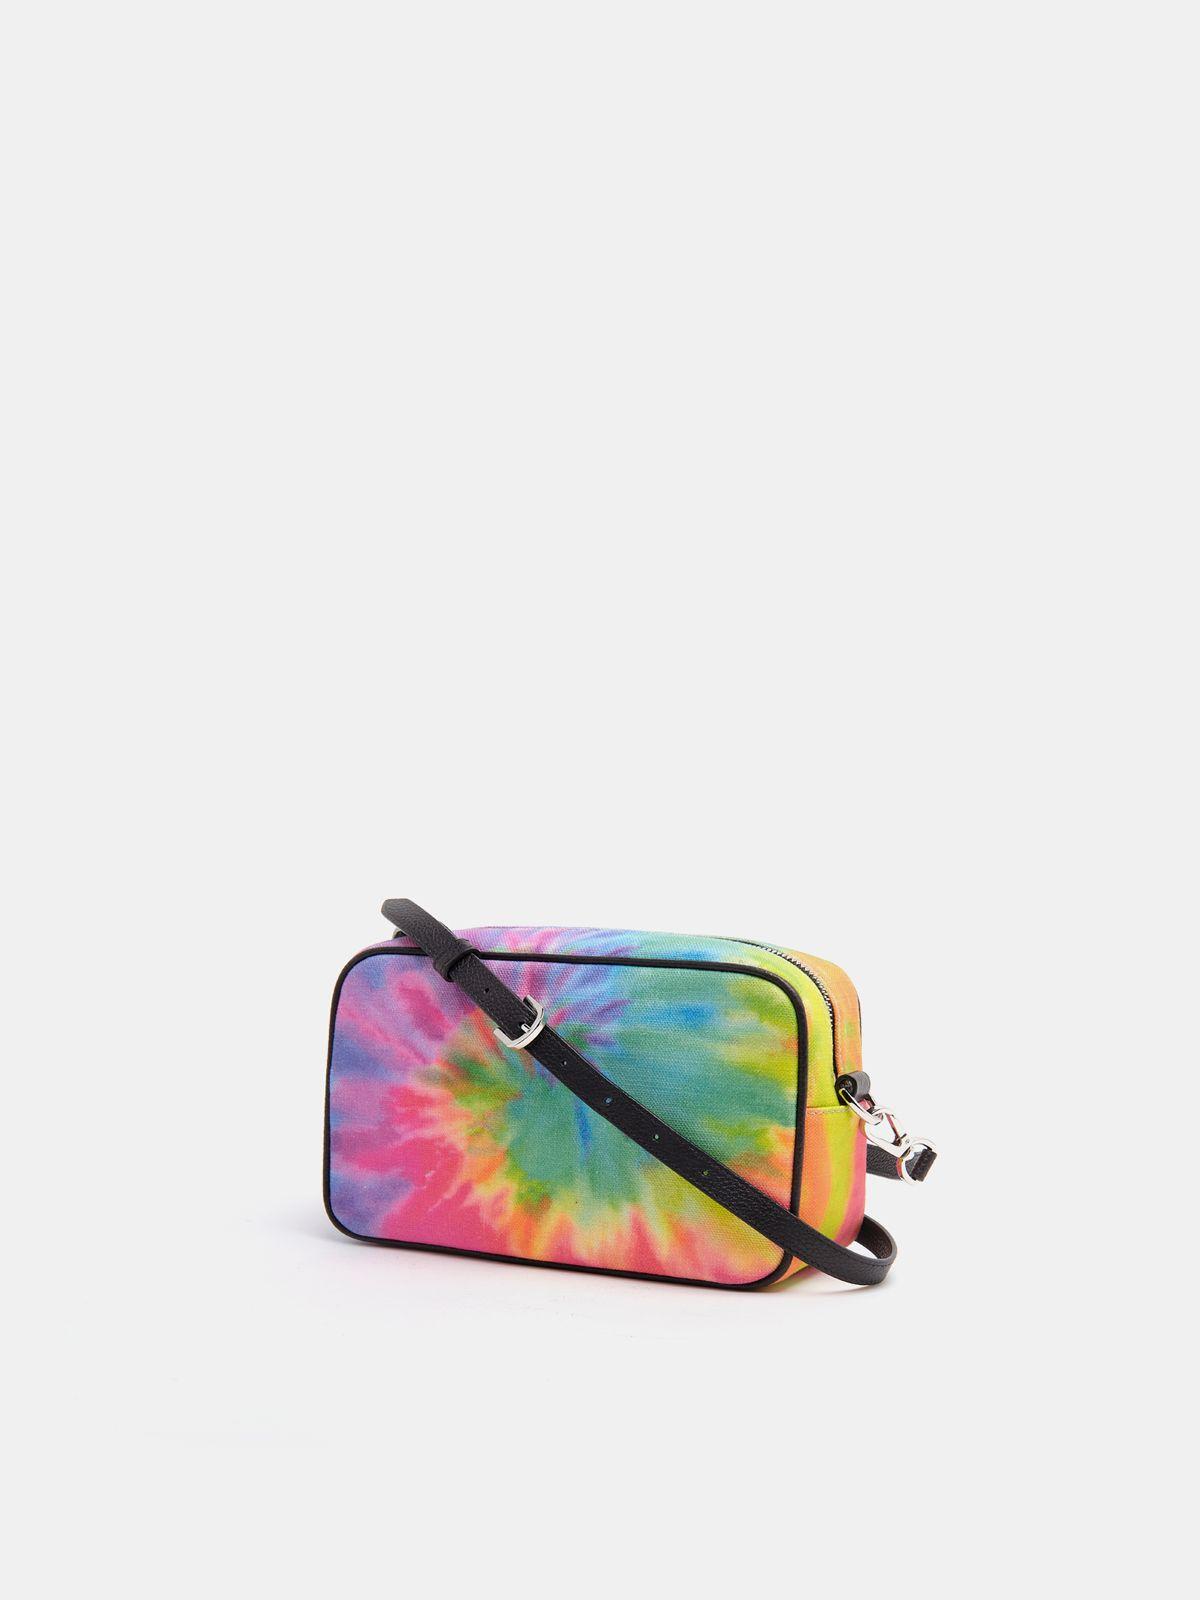 Golden Goose - Borsa Star Bag tie-dye stella con cristalli in